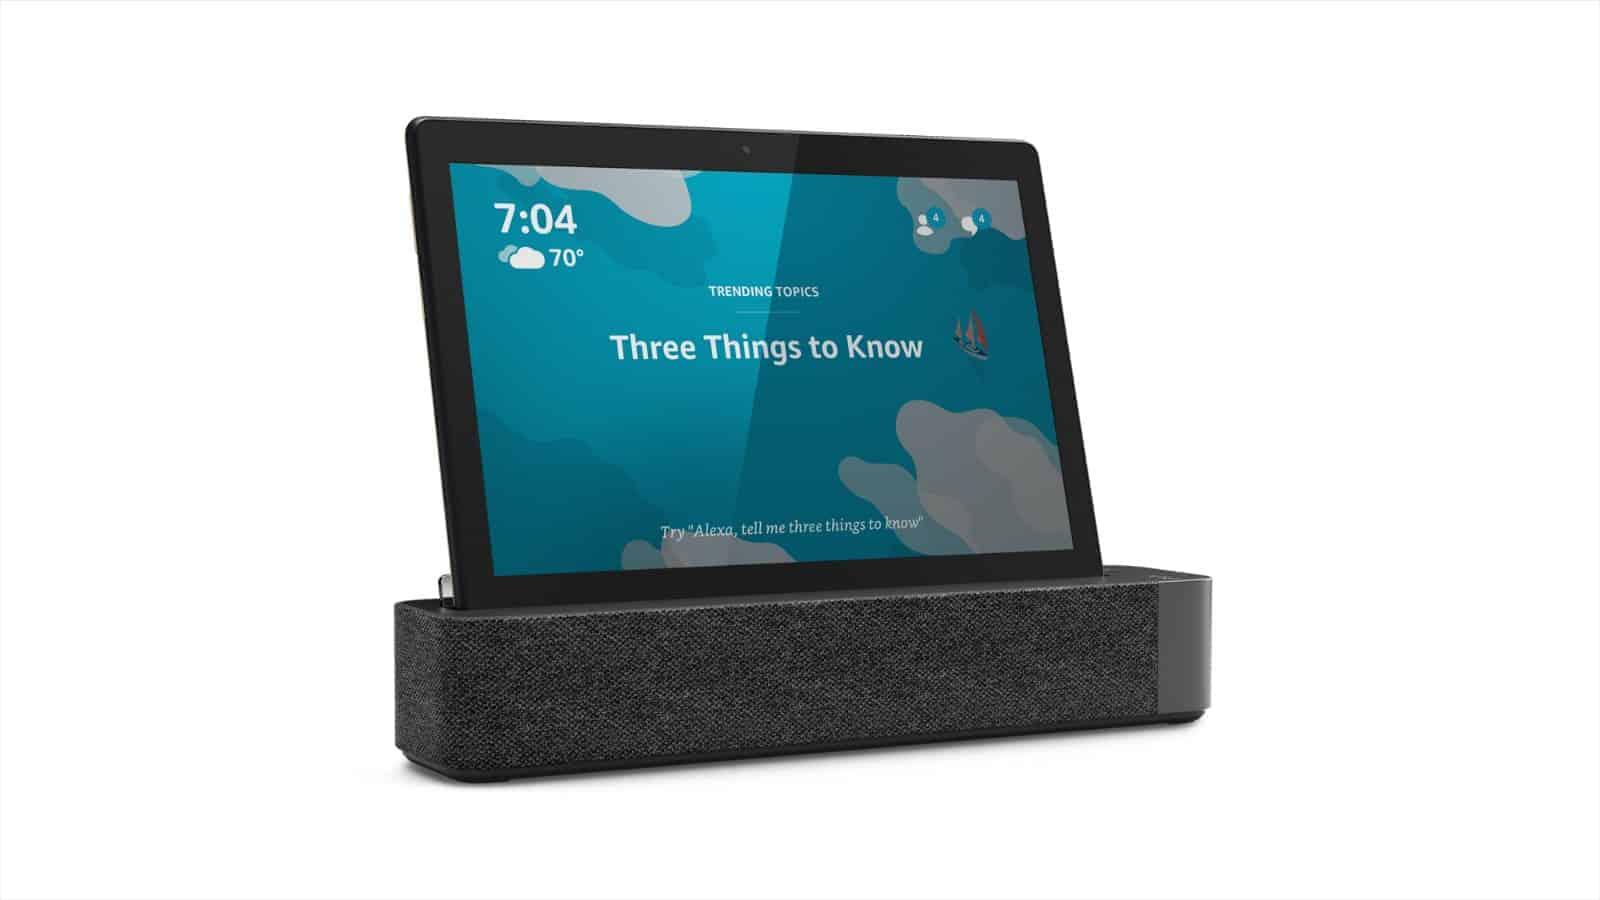 Lenovo Smart Tab M10 image 27